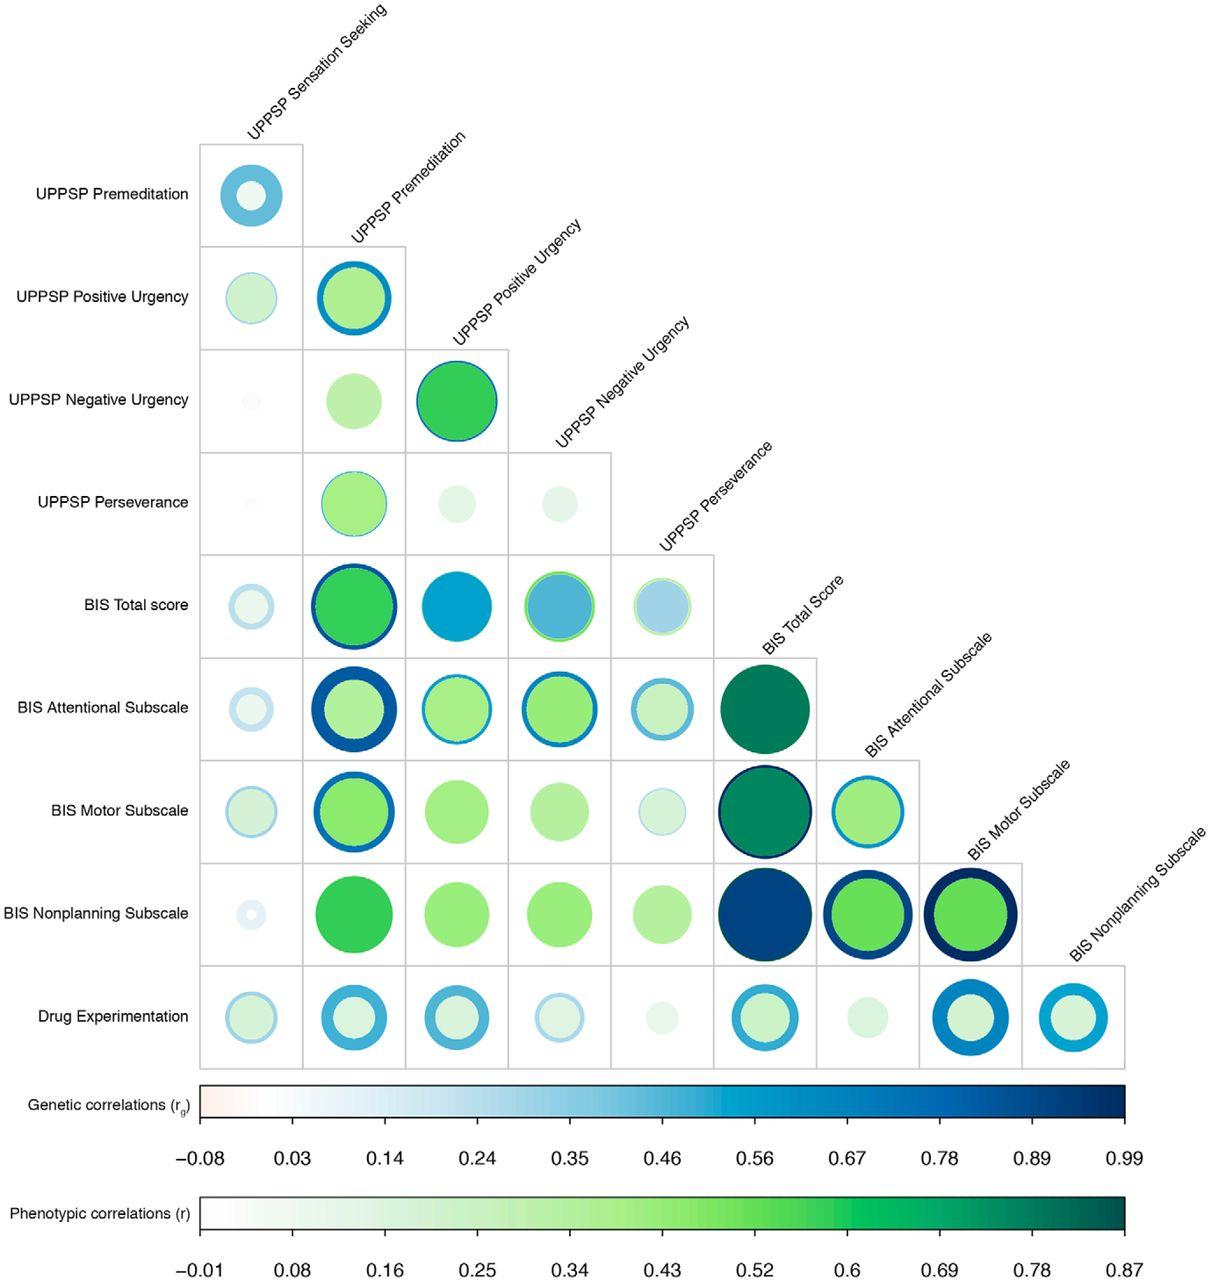 Genome-Wide Association Studies of Impulsive Personality